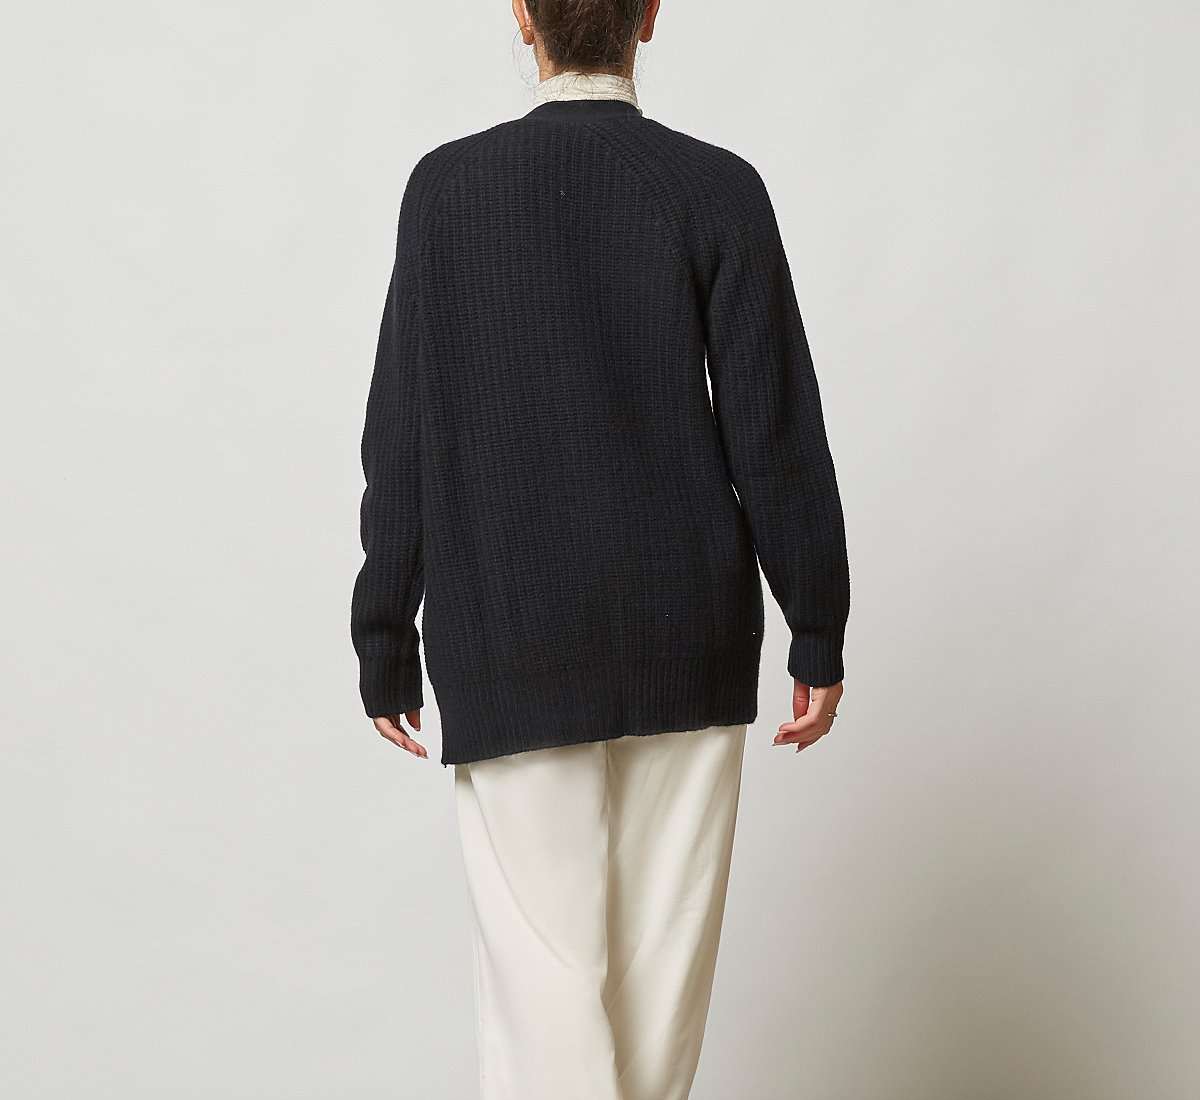 Cardigan in cashmere